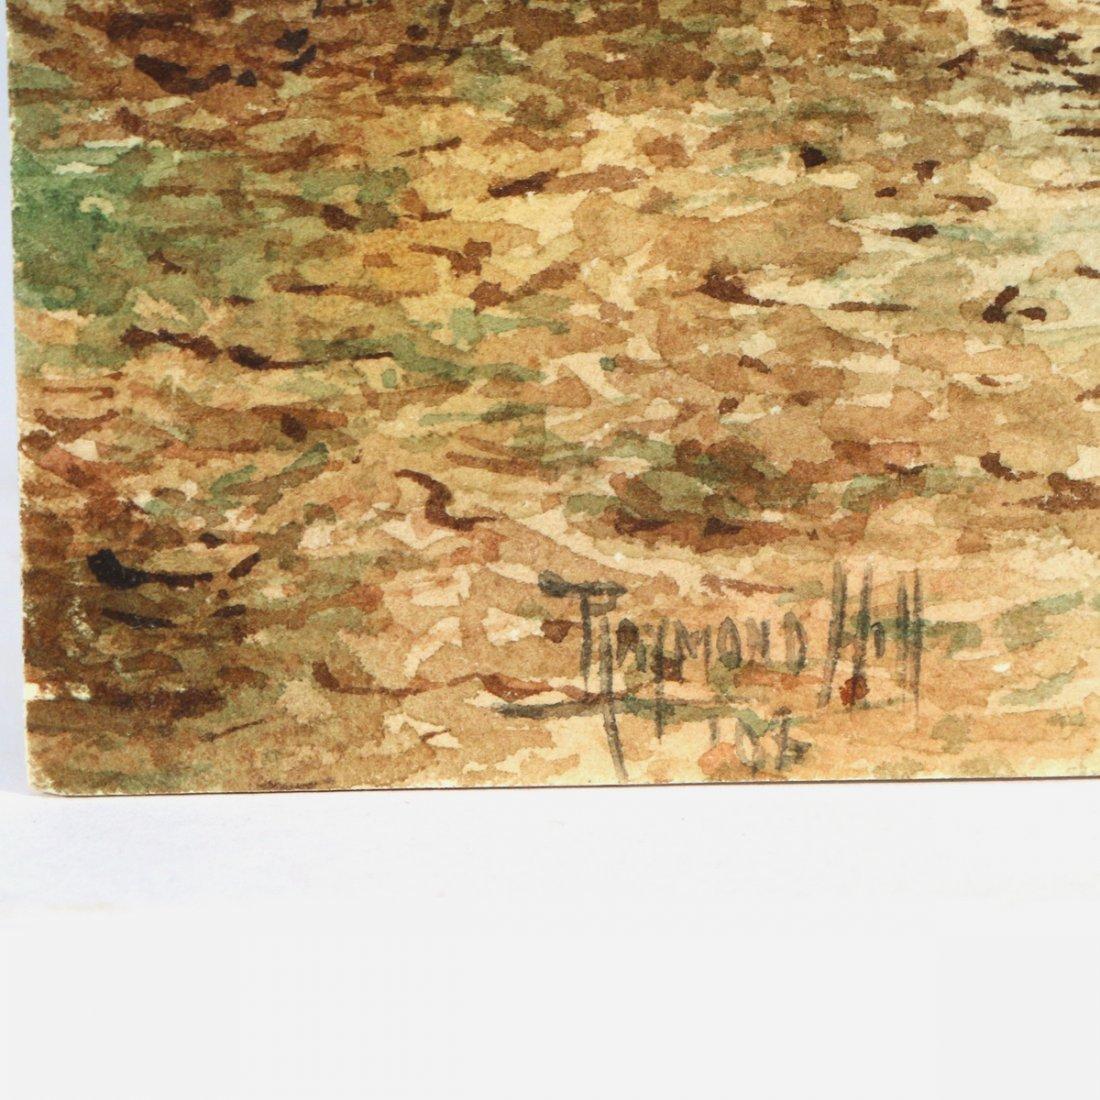 (3pc) E. BUCKLER SEPIA TONED LANDSCAPES - 6